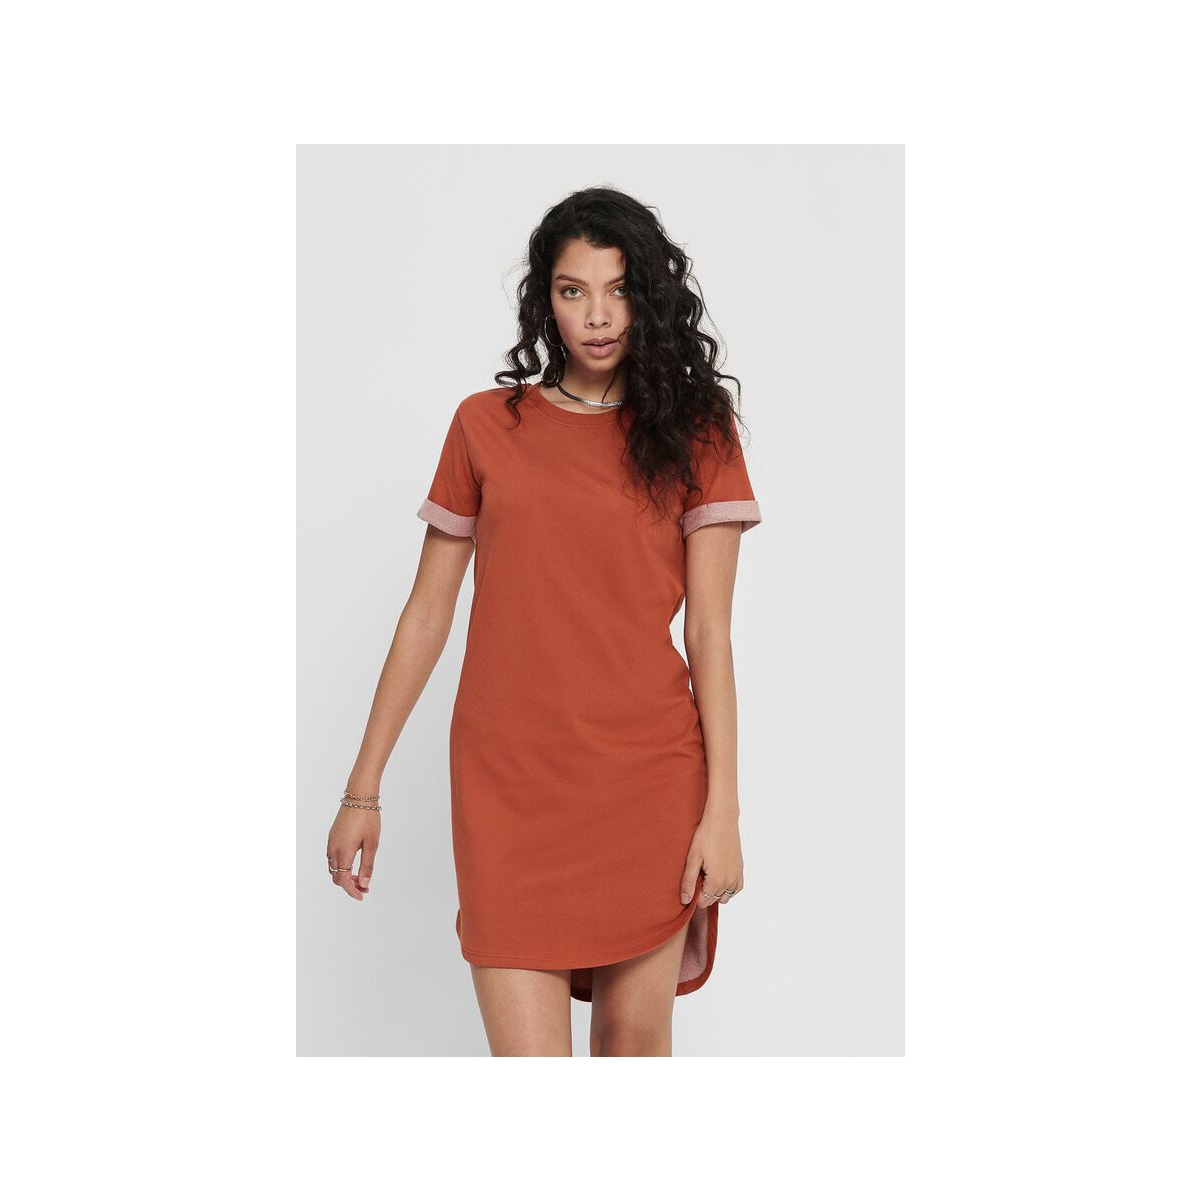 jdyivy life s/s dress jrs noos 15174793 jacqueline de yong jurk hot sauce